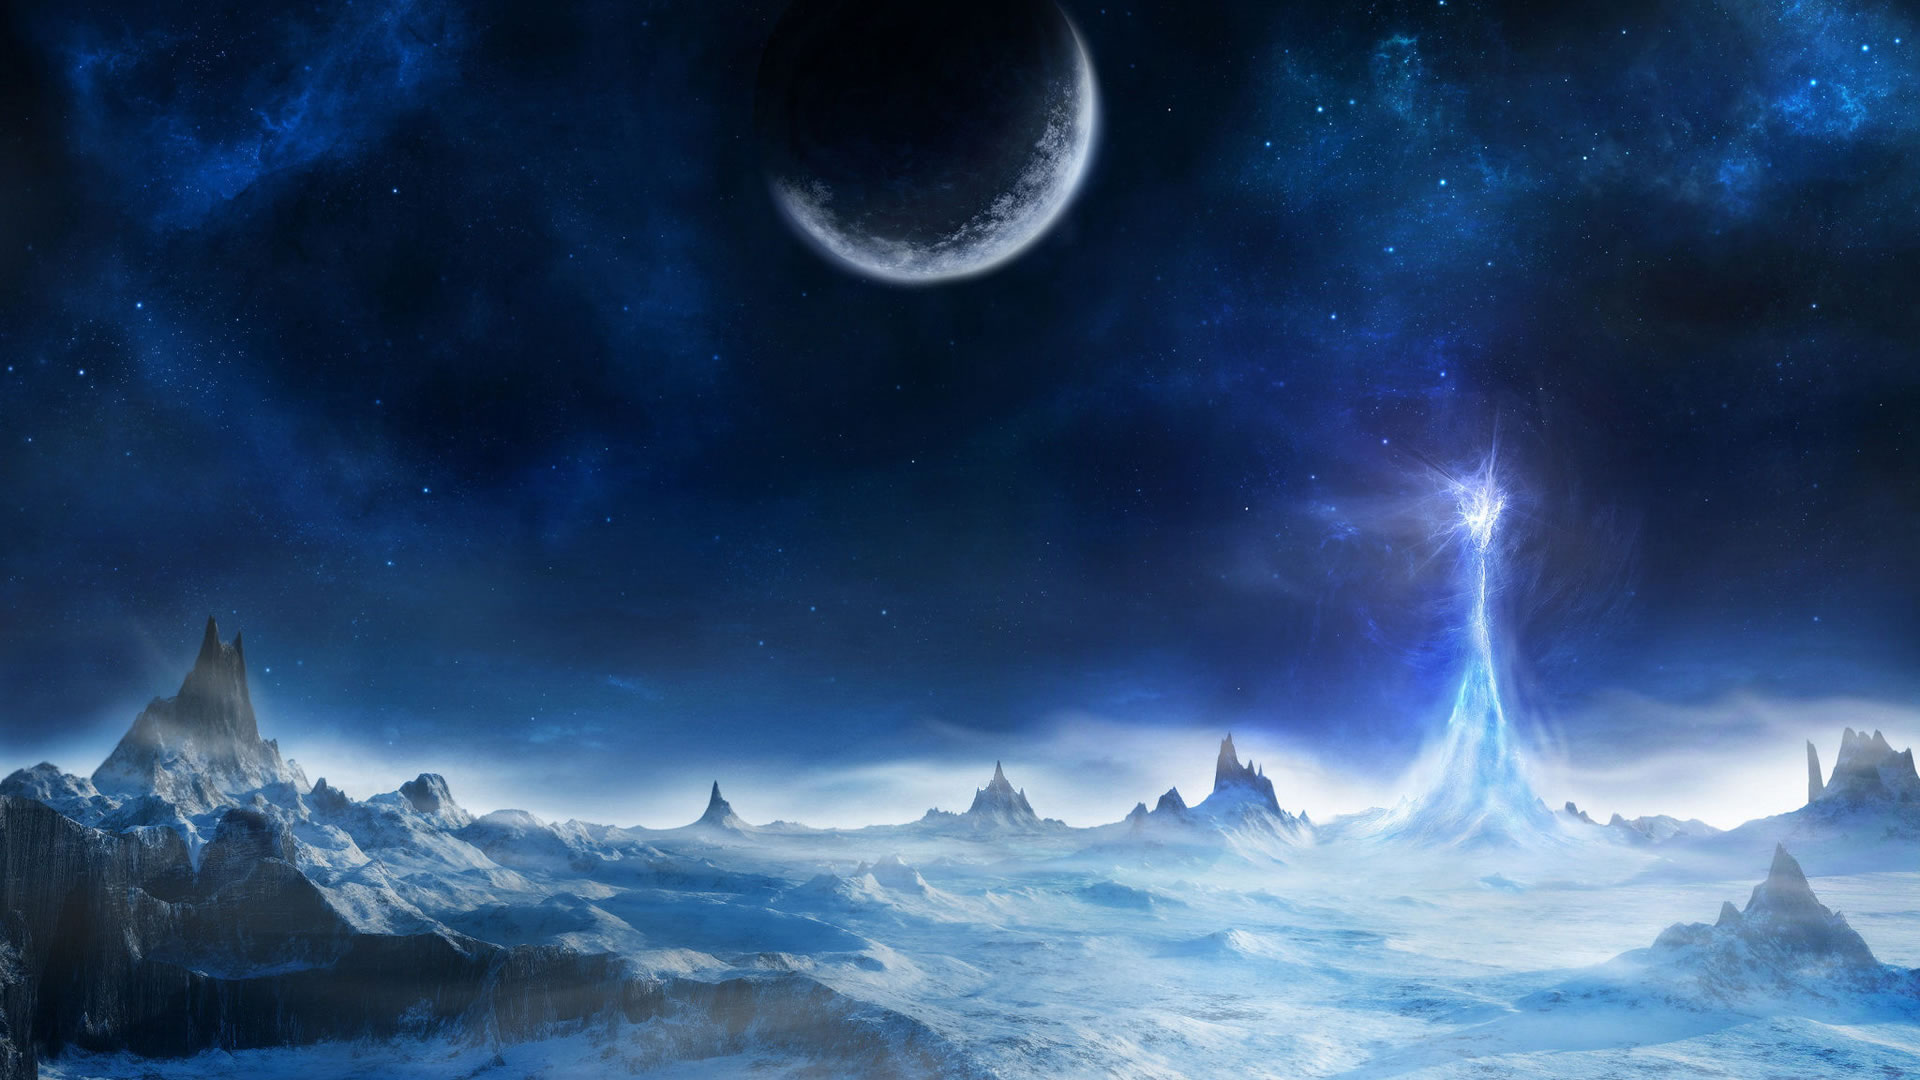 Fantasy High Definition - Fantasy Snow Landscape , HD Wallpaper & Backgrounds